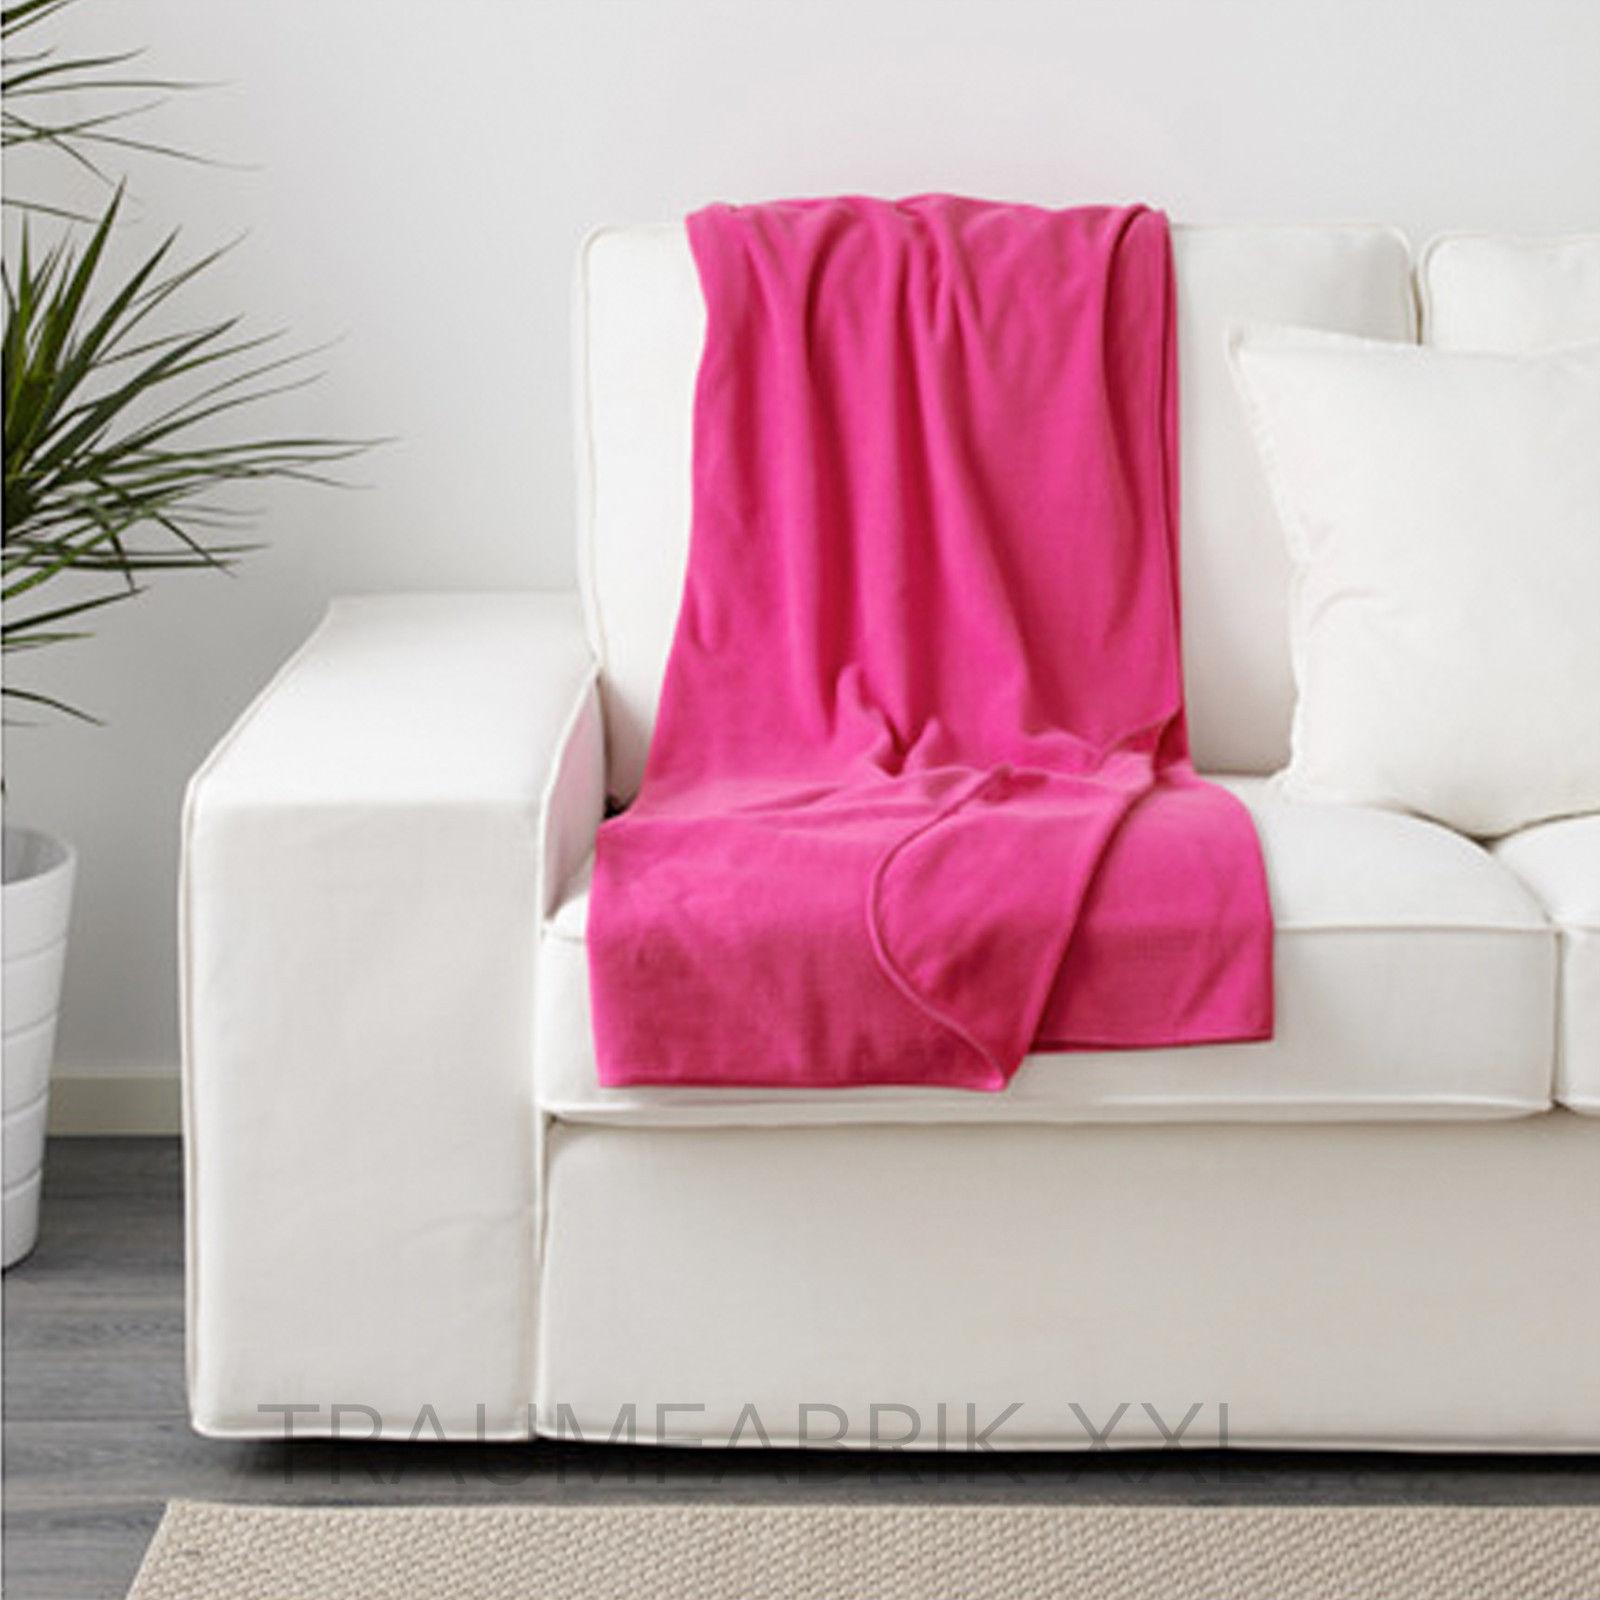 ecksofa fr trendy fabulous sofa hussen fur ecksofa. Black Bedroom Furniture Sets. Home Design Ideas